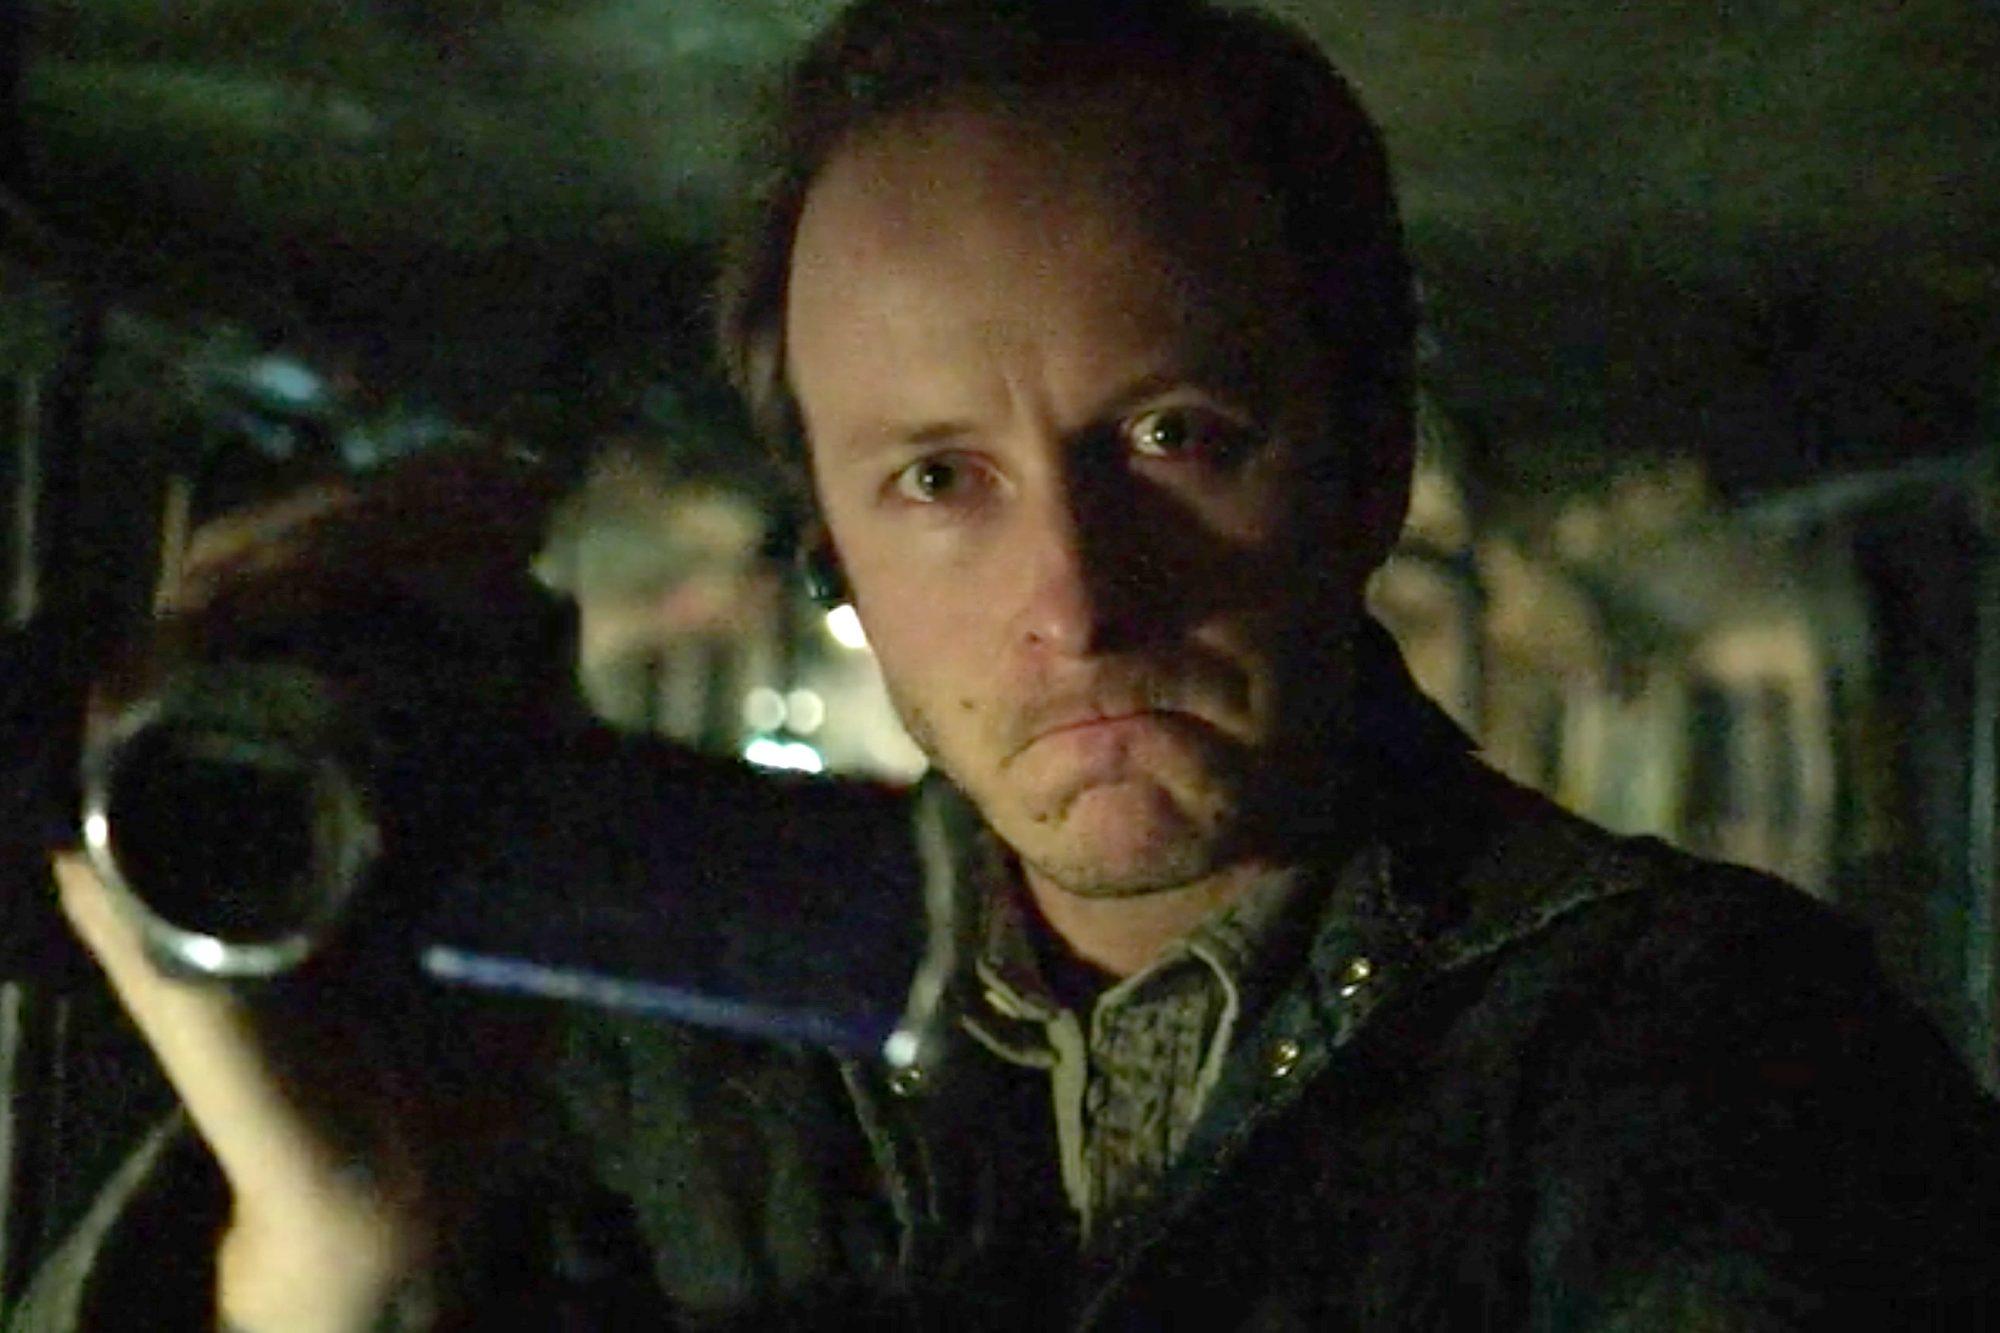 Christopher Redman as Joseph Falk